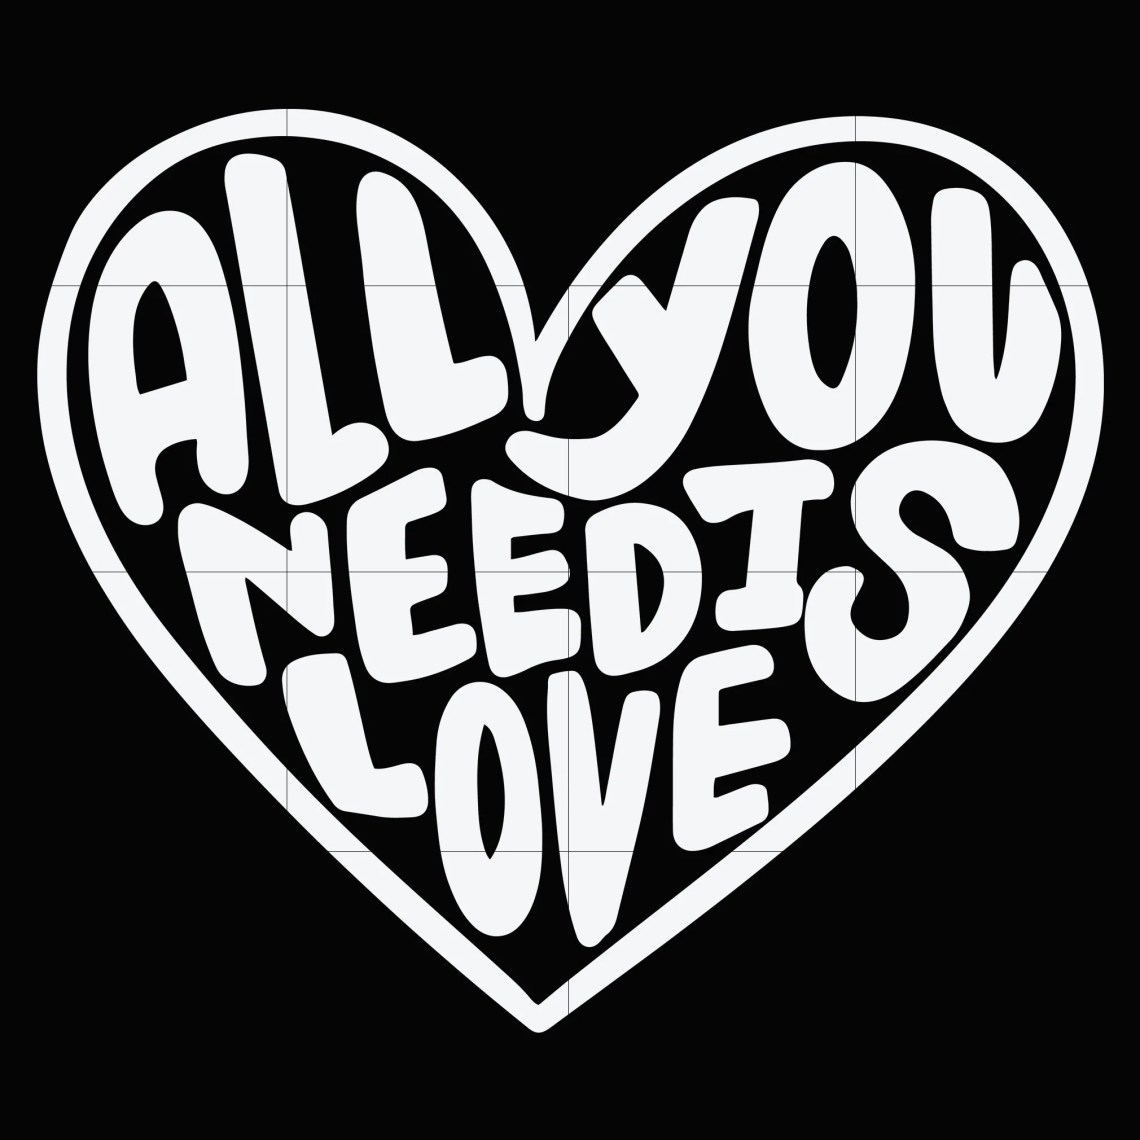 Download All you need is love svg, Valentine Svg, Love Svg ...